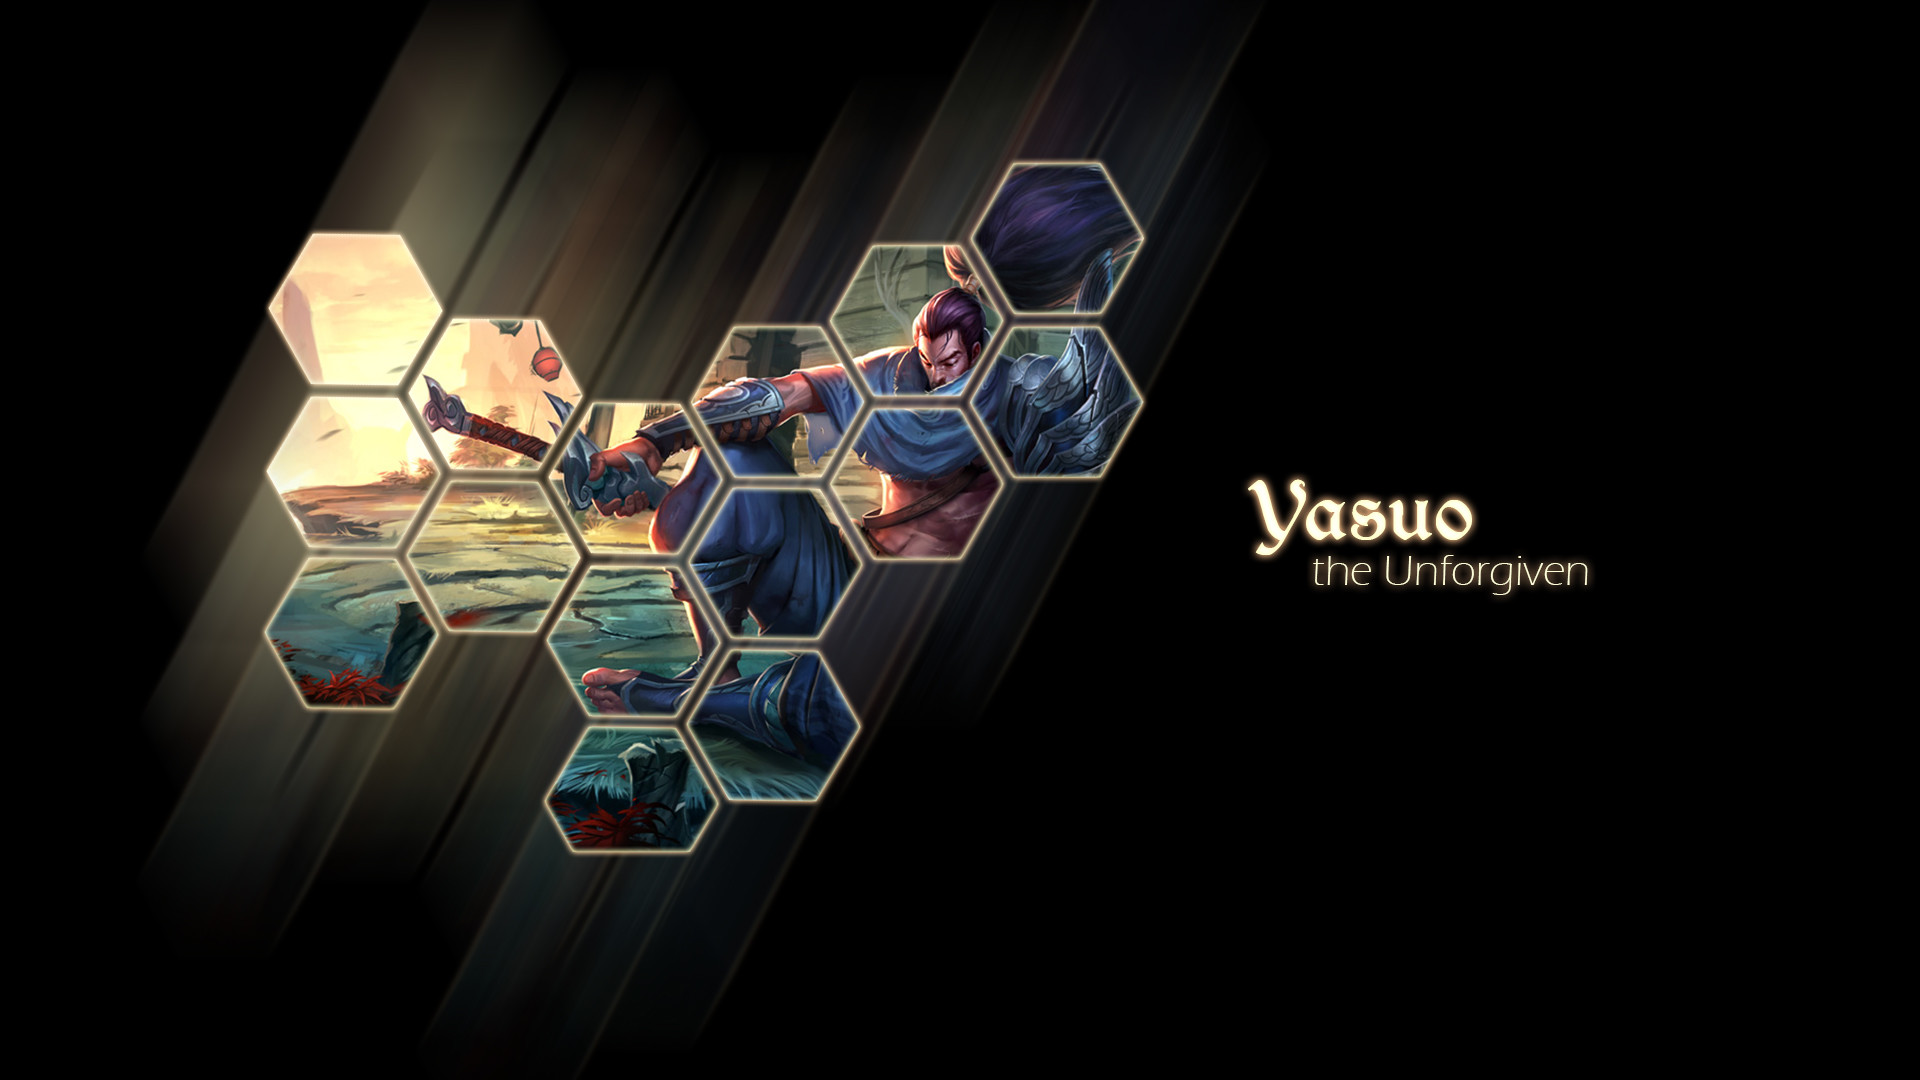 yasuo league of legends game hd wallpaper 1080p original .